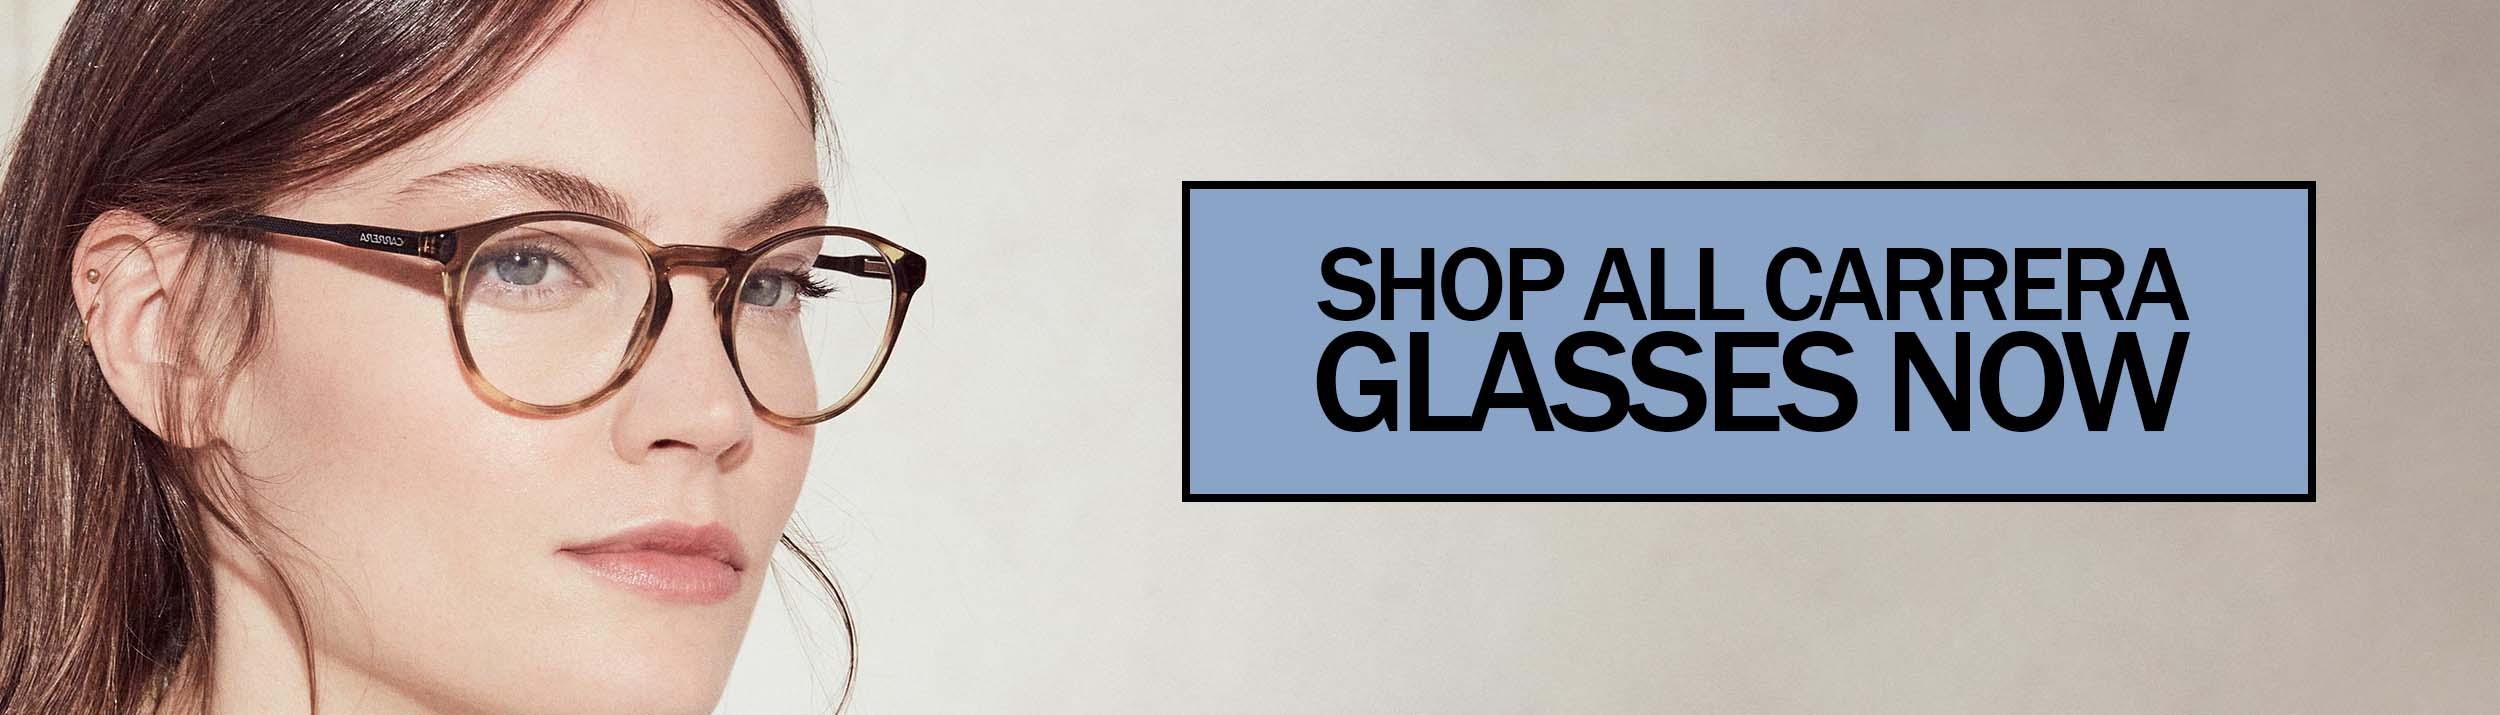 carrera glasses online uk